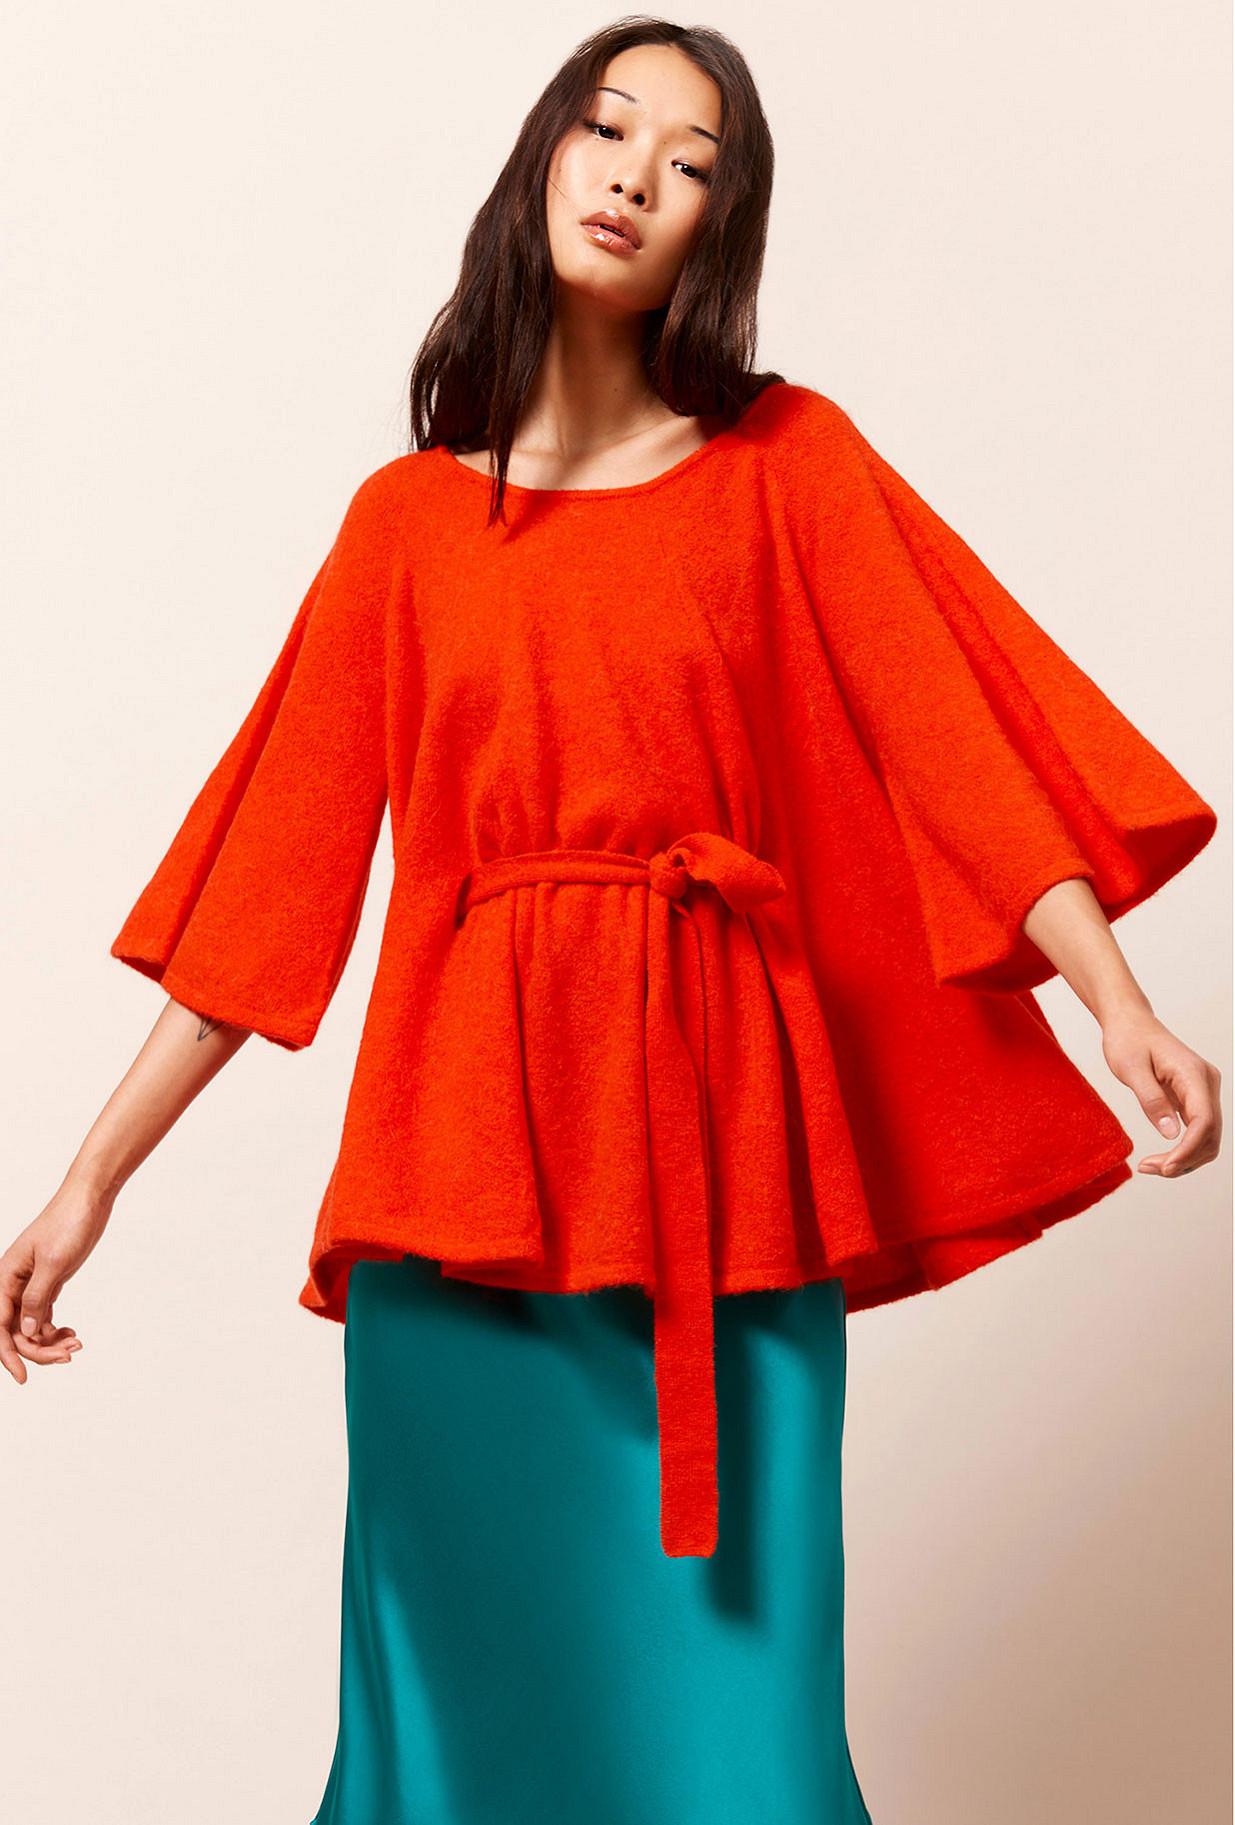 Paris clothes store Sweater  Pampa french designer fashion Paris